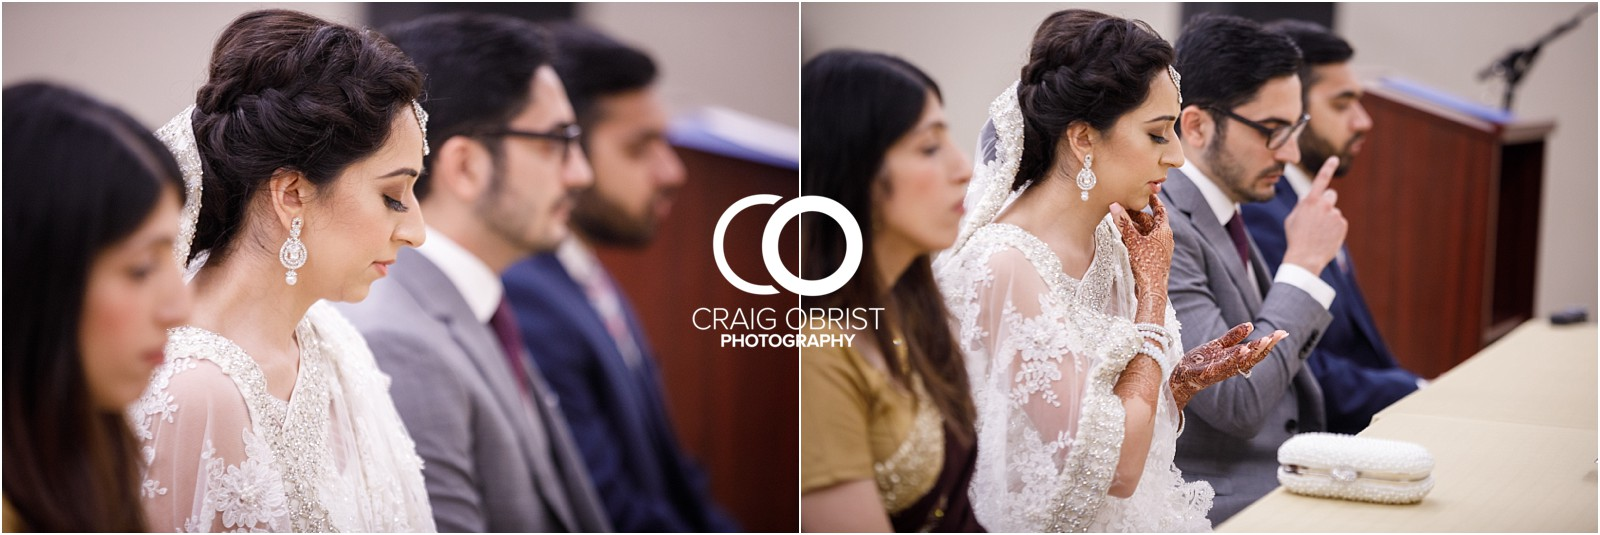 Atlanta Hilton Northeast South Asian Wedding Portraits_0030.jpg